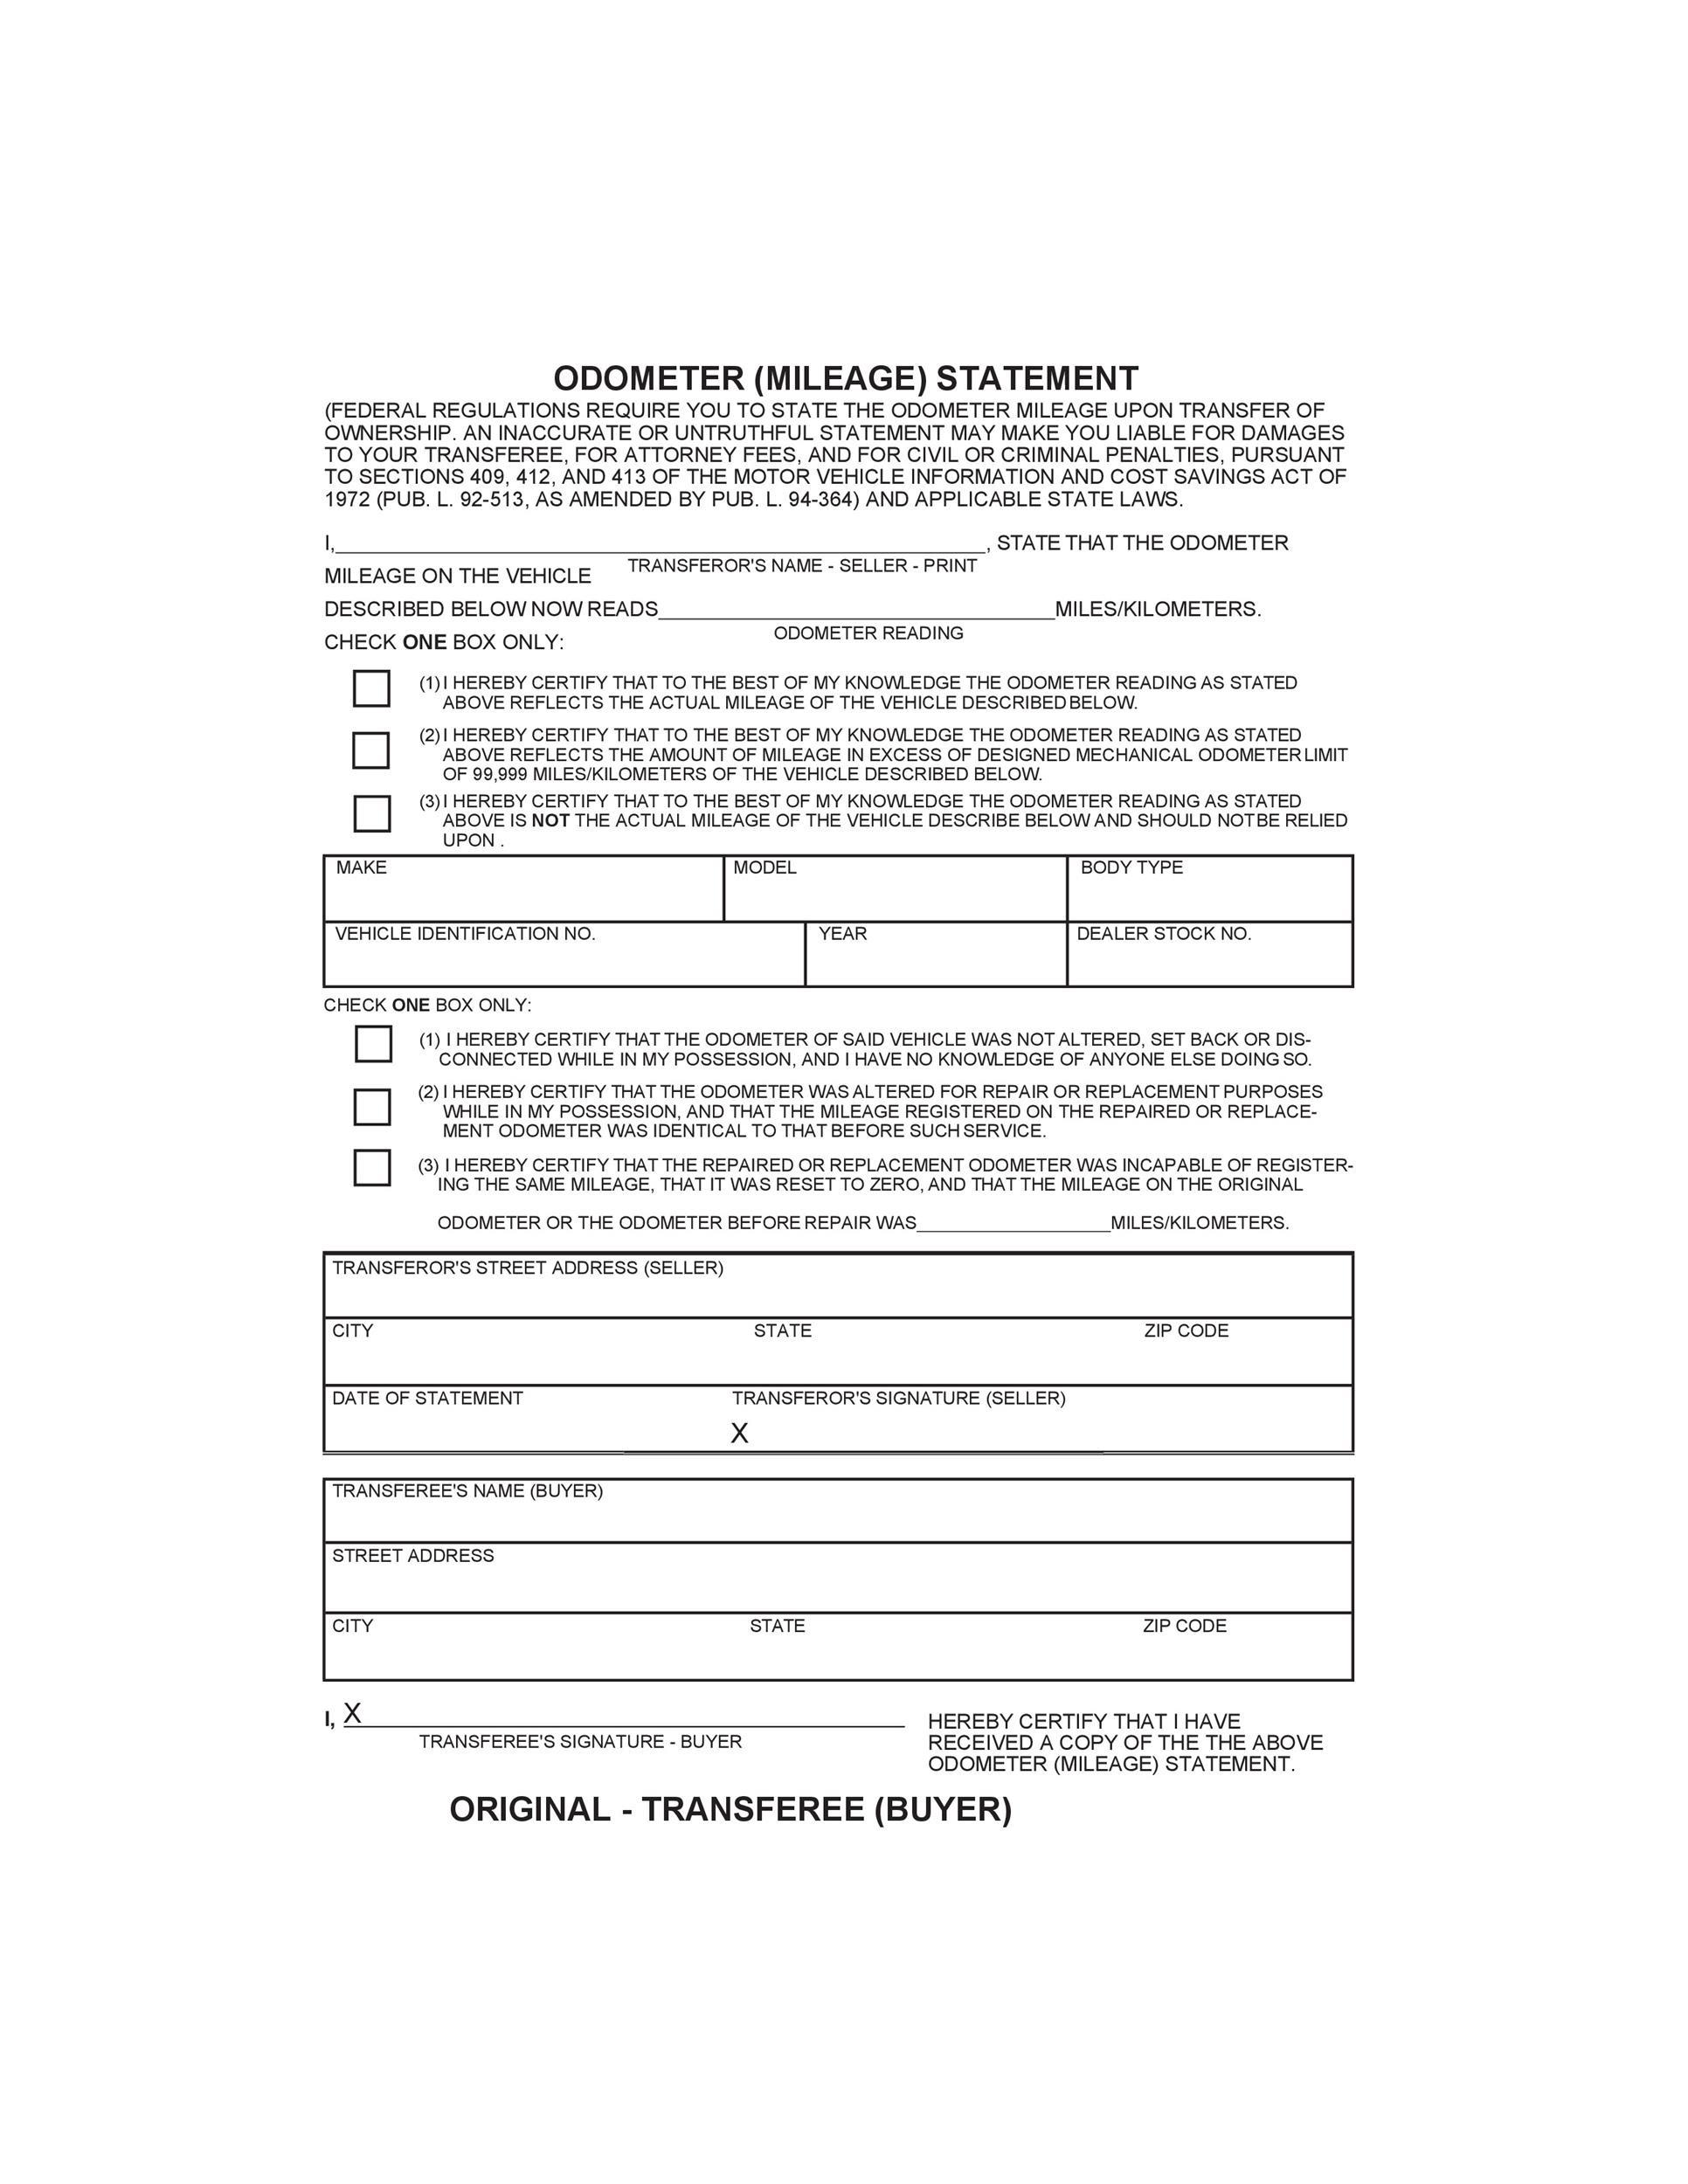 Free odometer disclosure statement 10